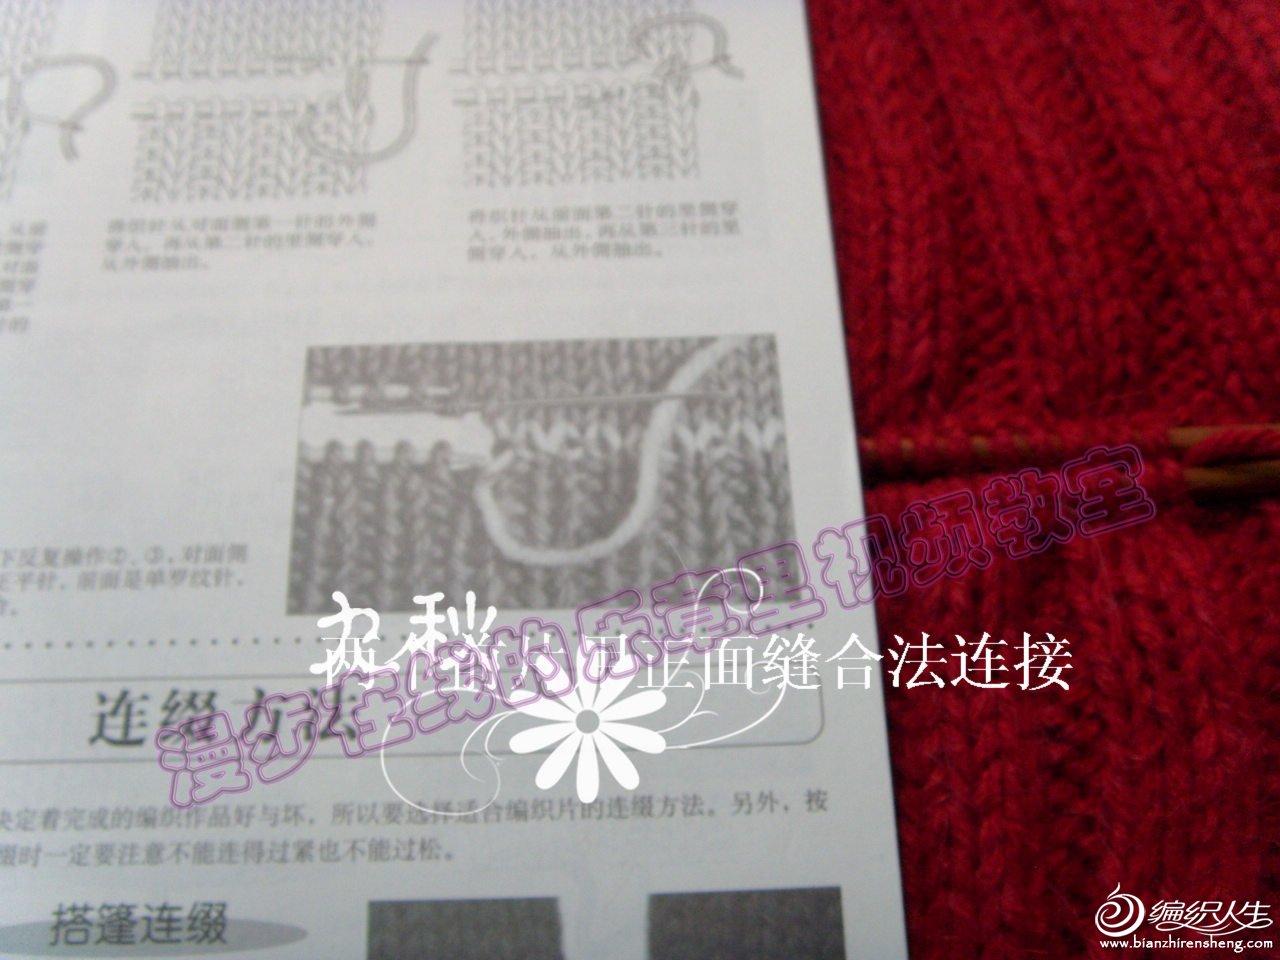 S73R5051.jpg